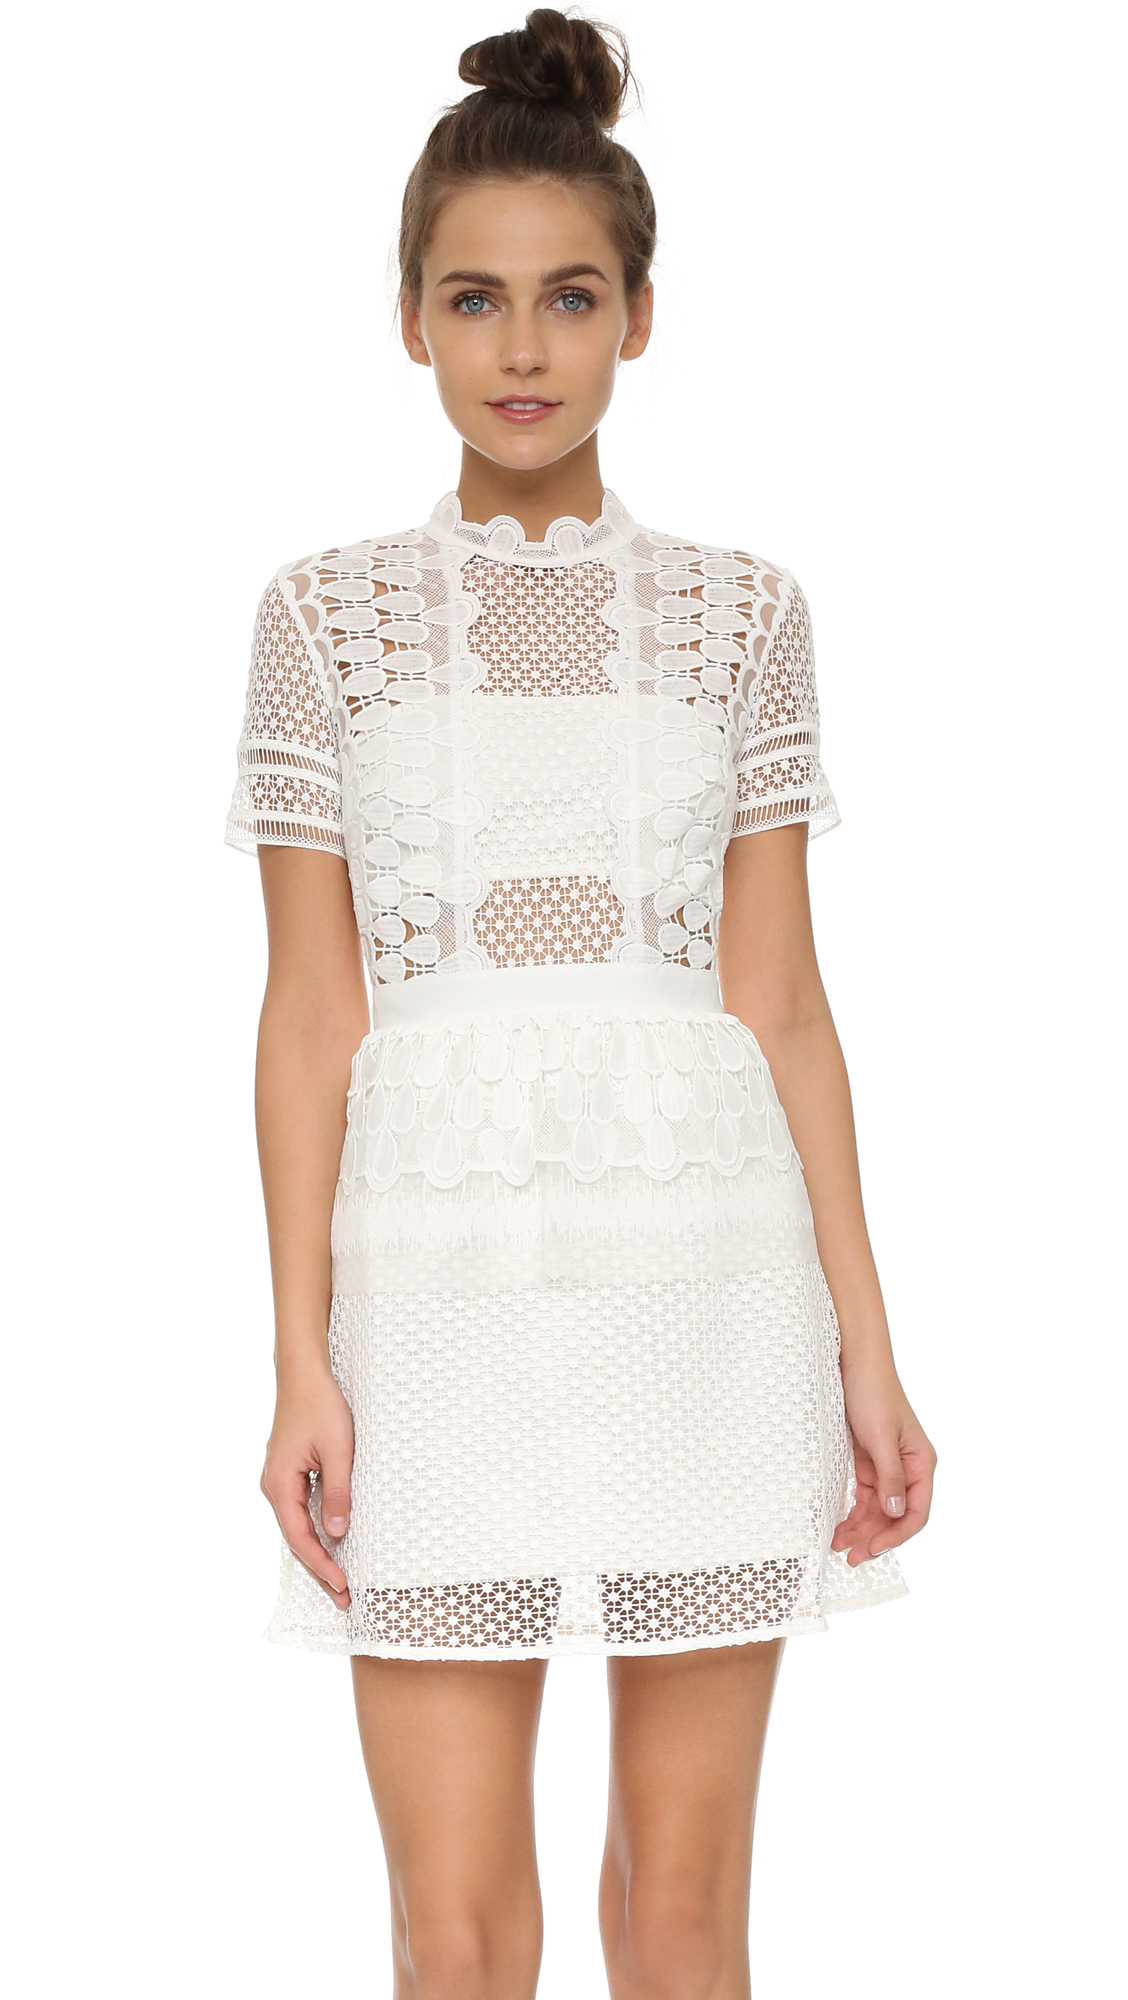 Lyst - Self-Portrait Guipure Lace Peplum Mini Dress in White